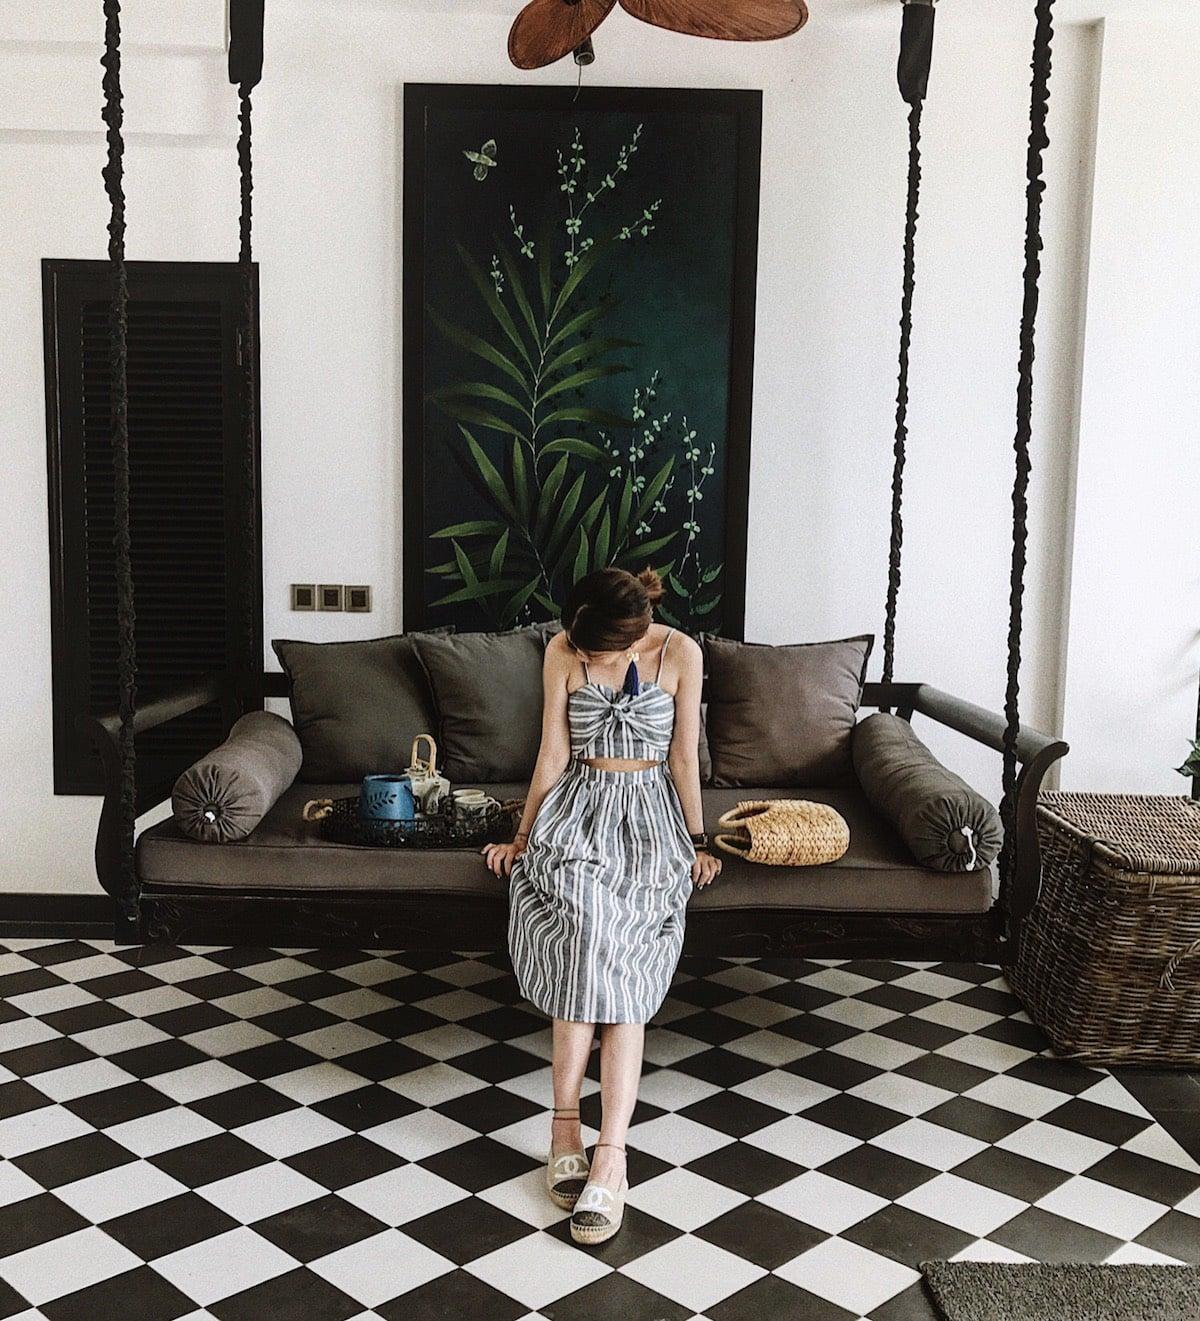 Jess Huynh